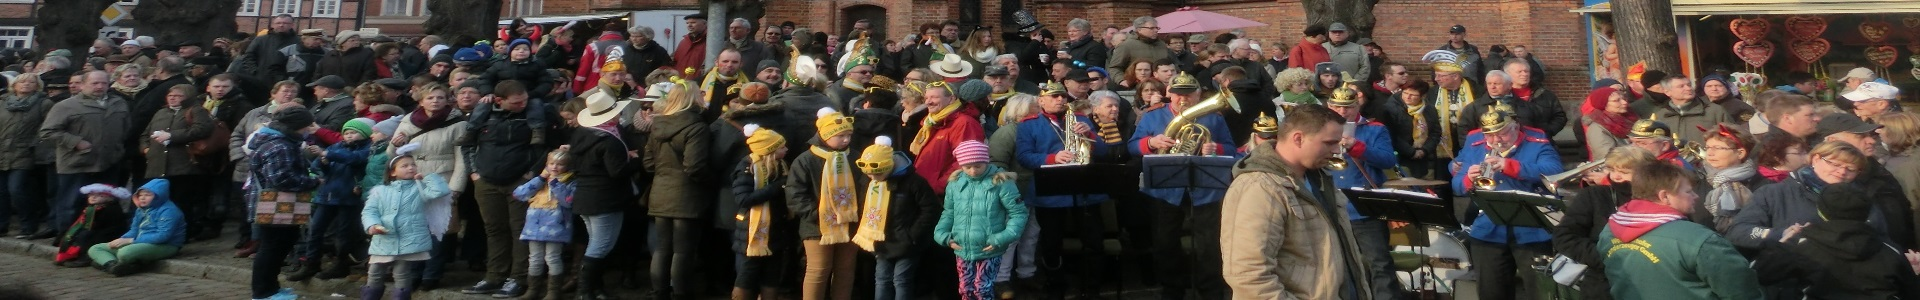 Dömitzer Karneval_Jörg Reichel